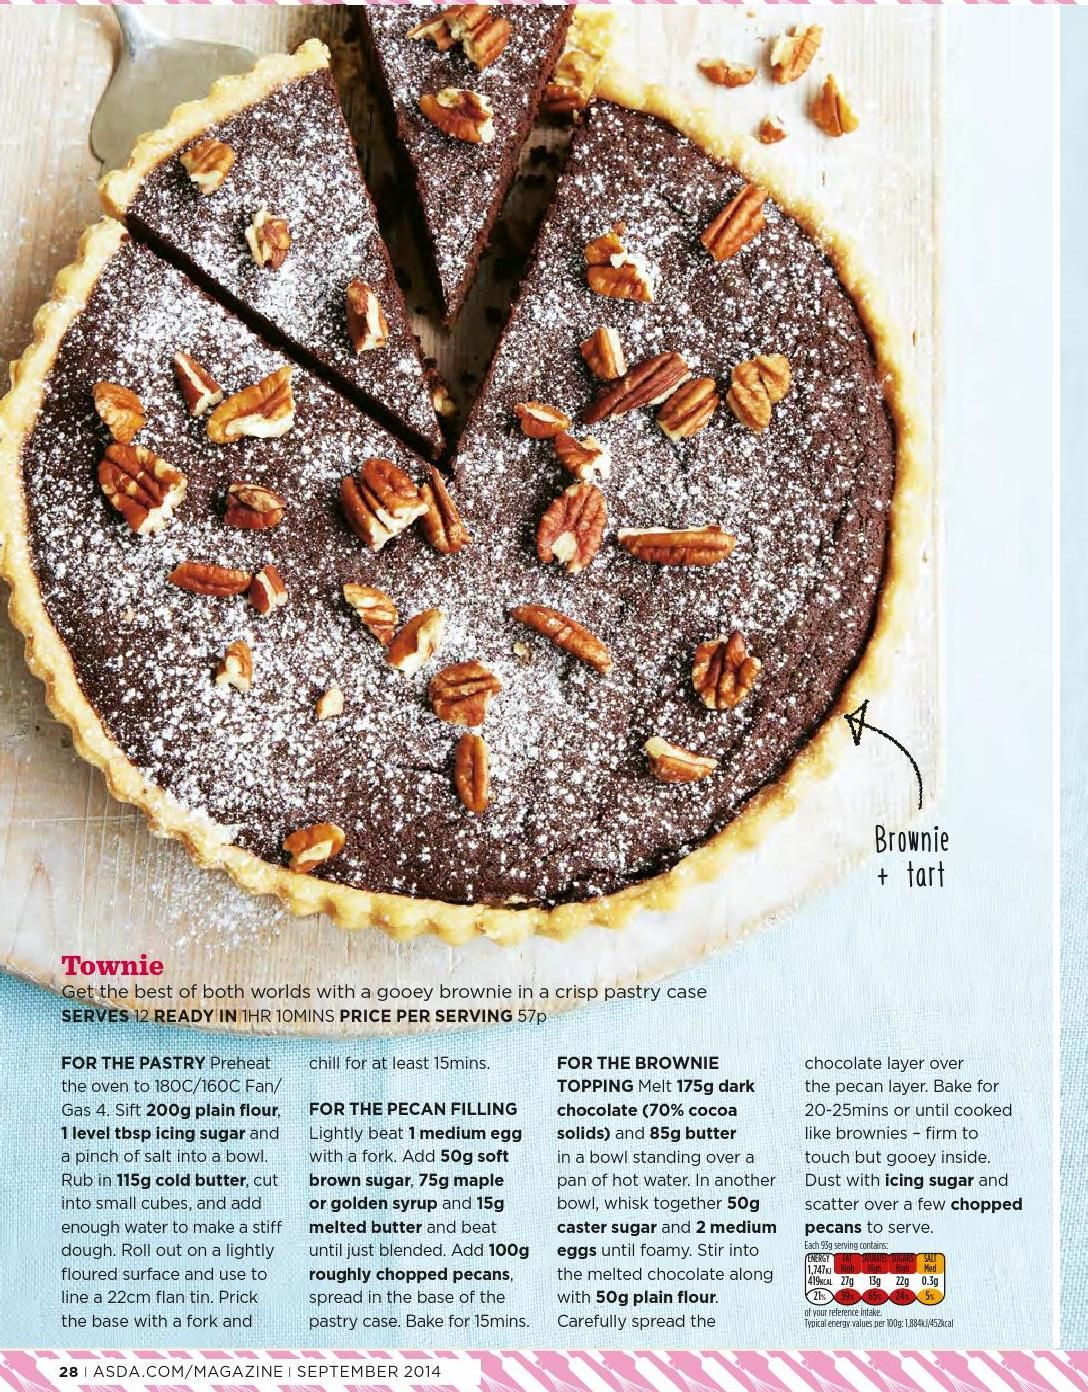 Asda magazine september 2014 sweet recipes chocolate